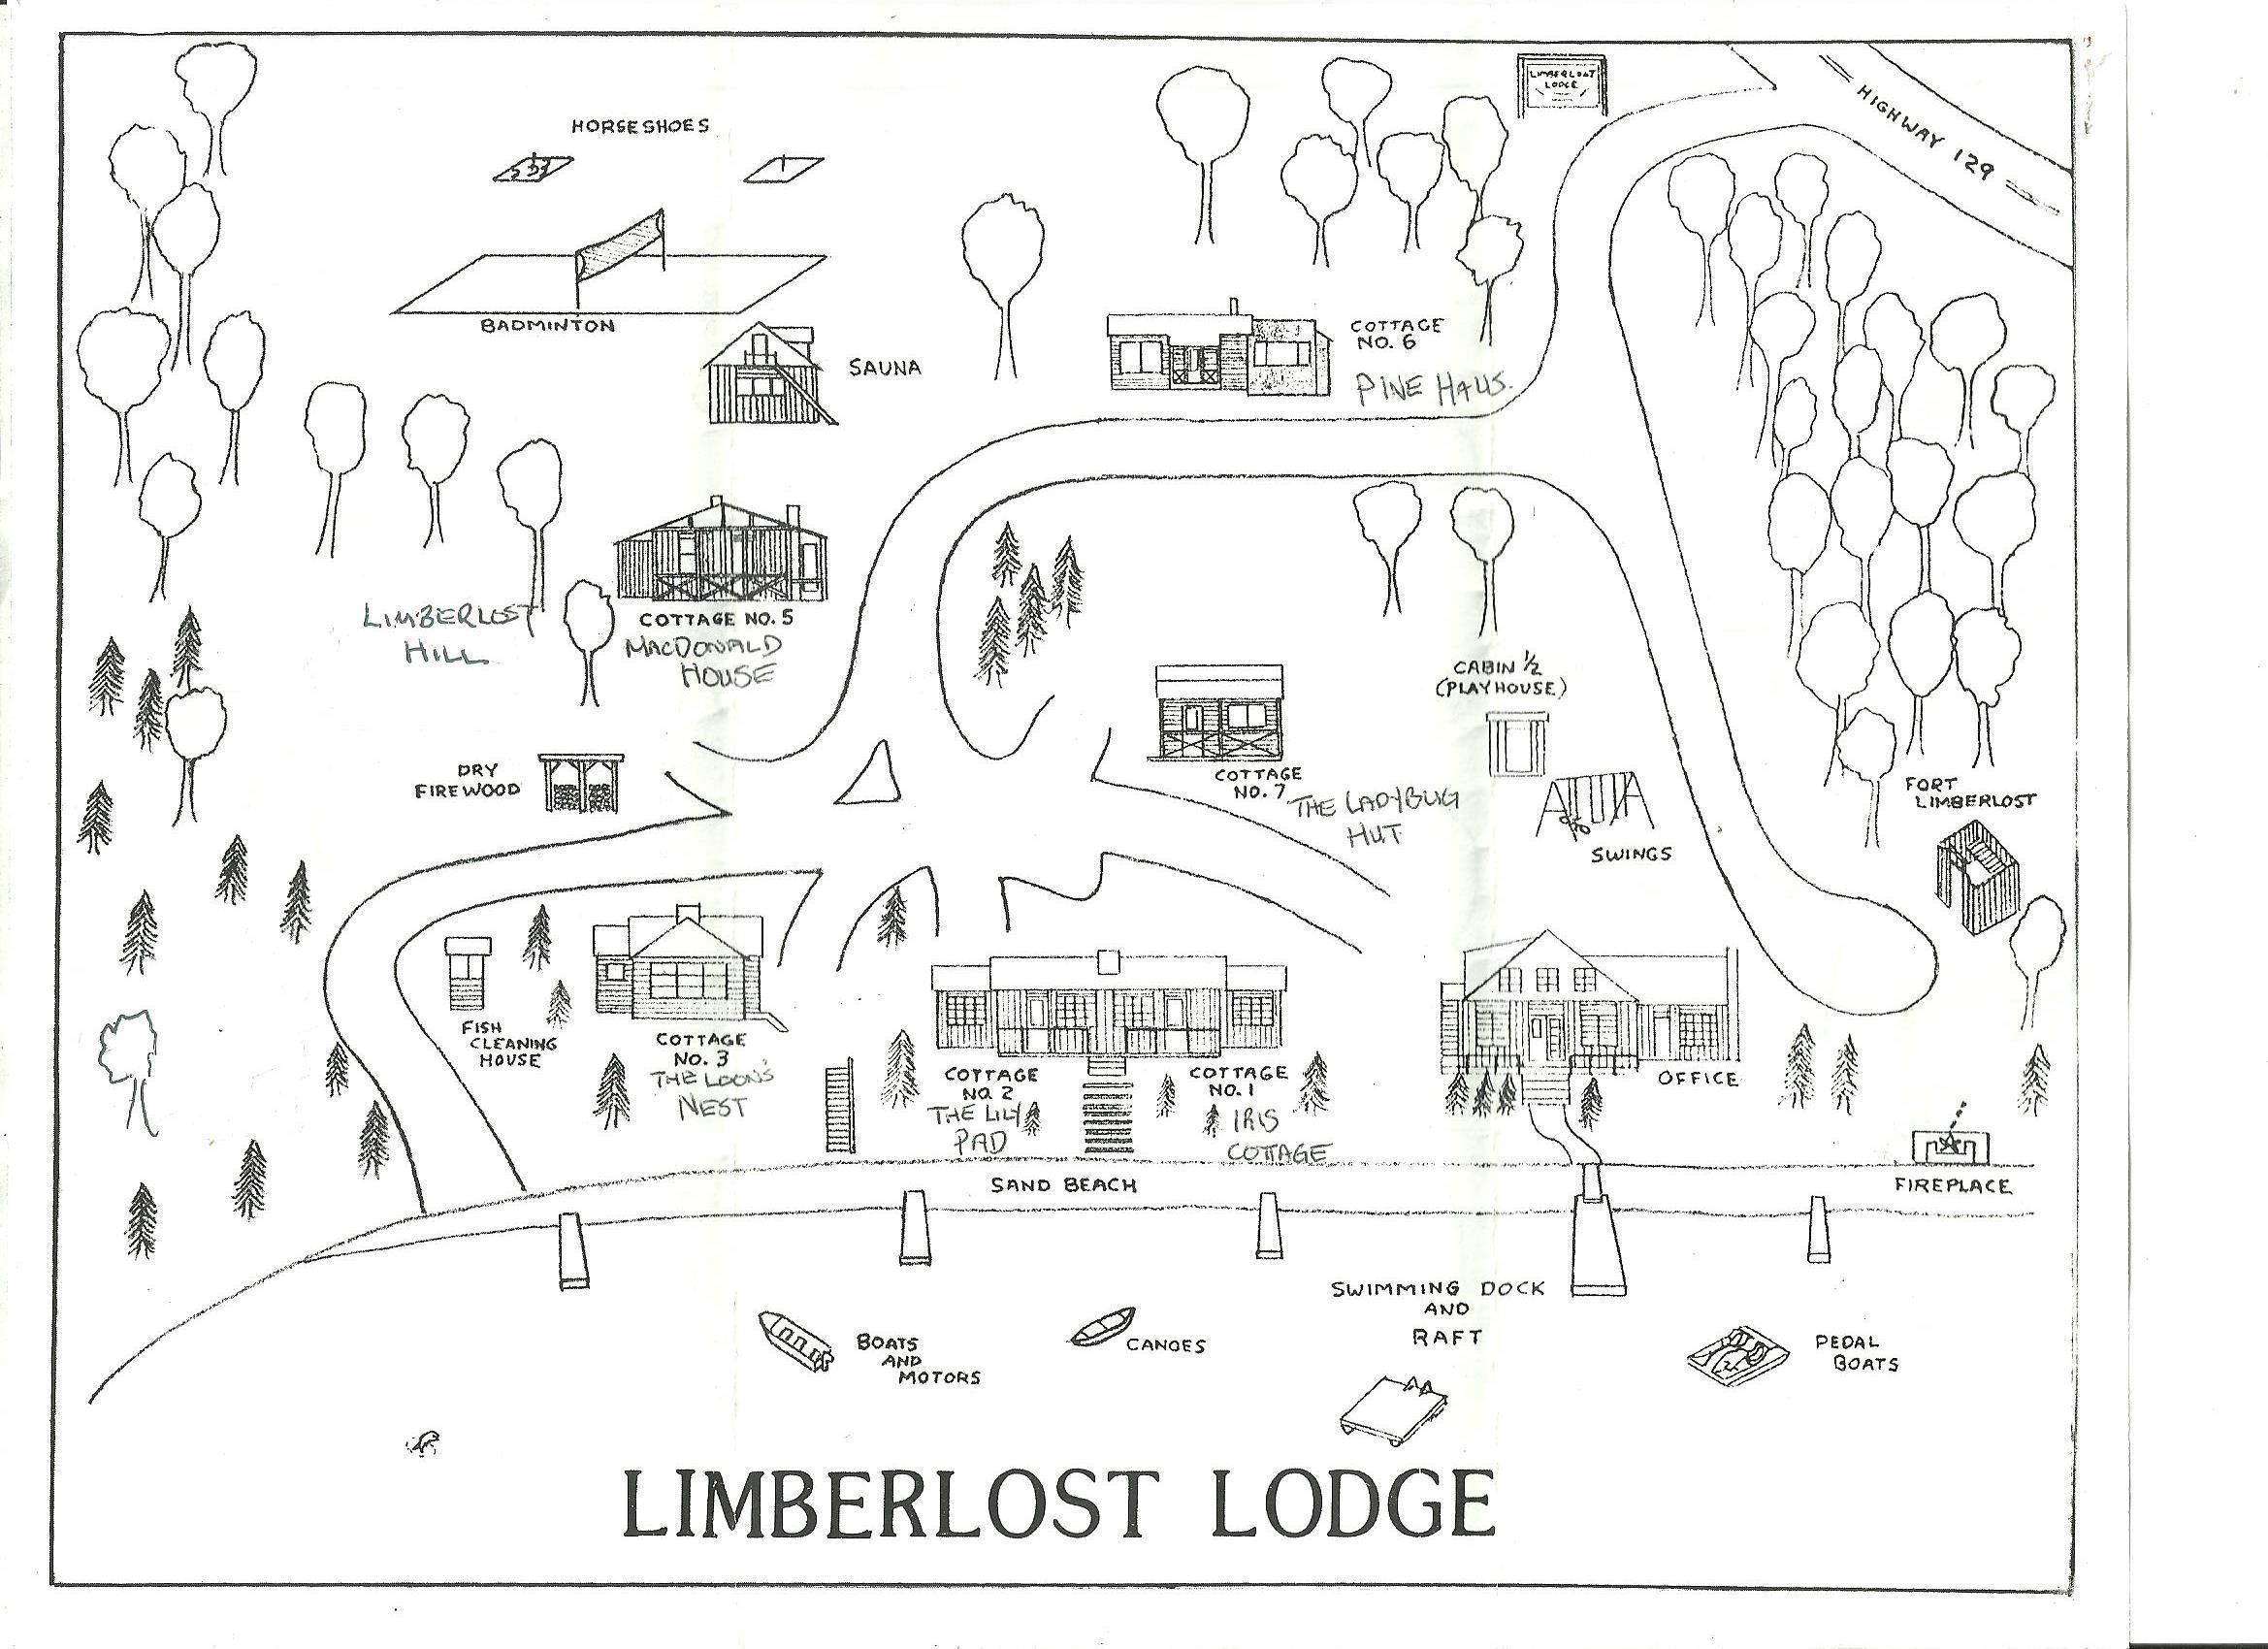 Limberlost Lodge Facility Map